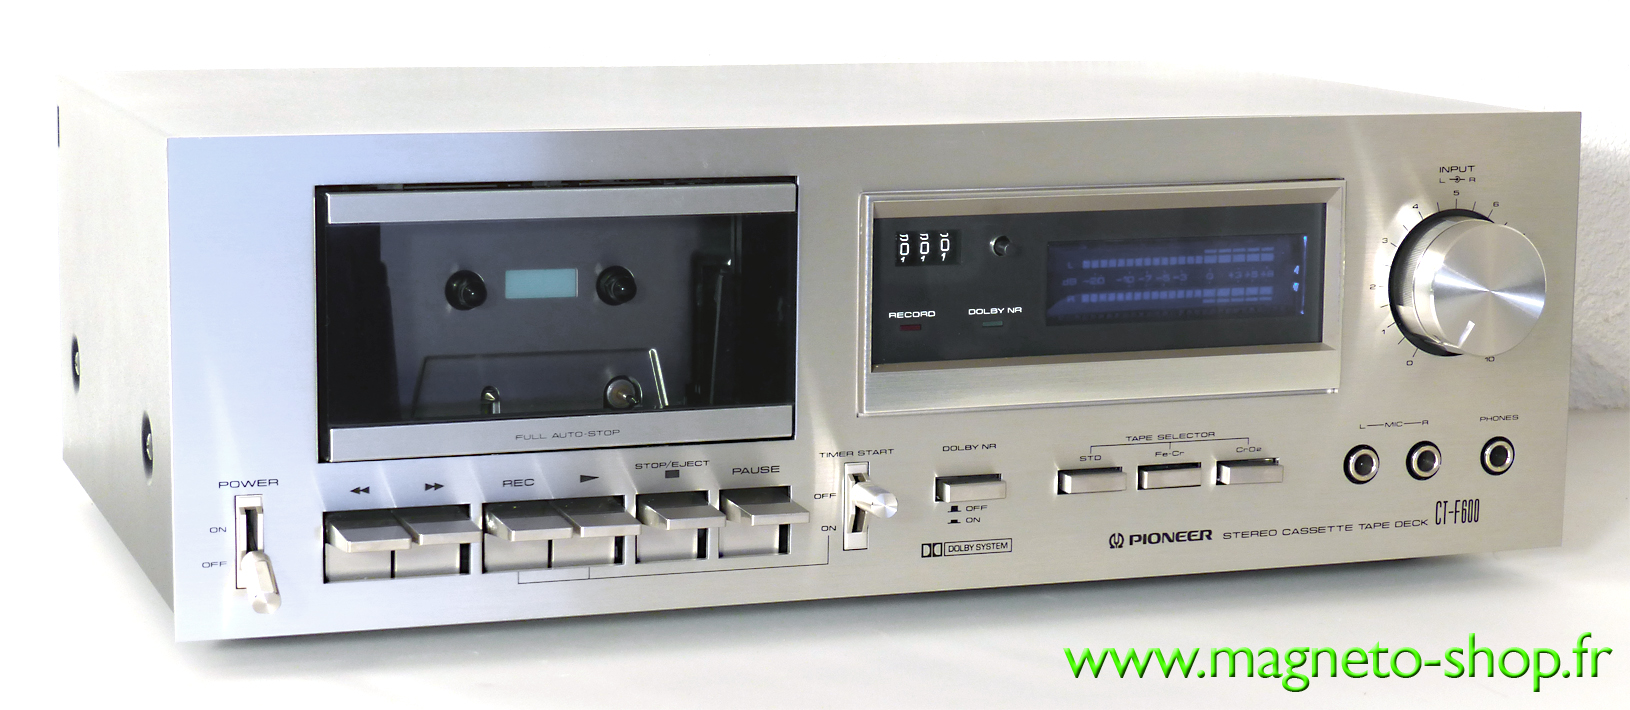 PIONEER CT-F600